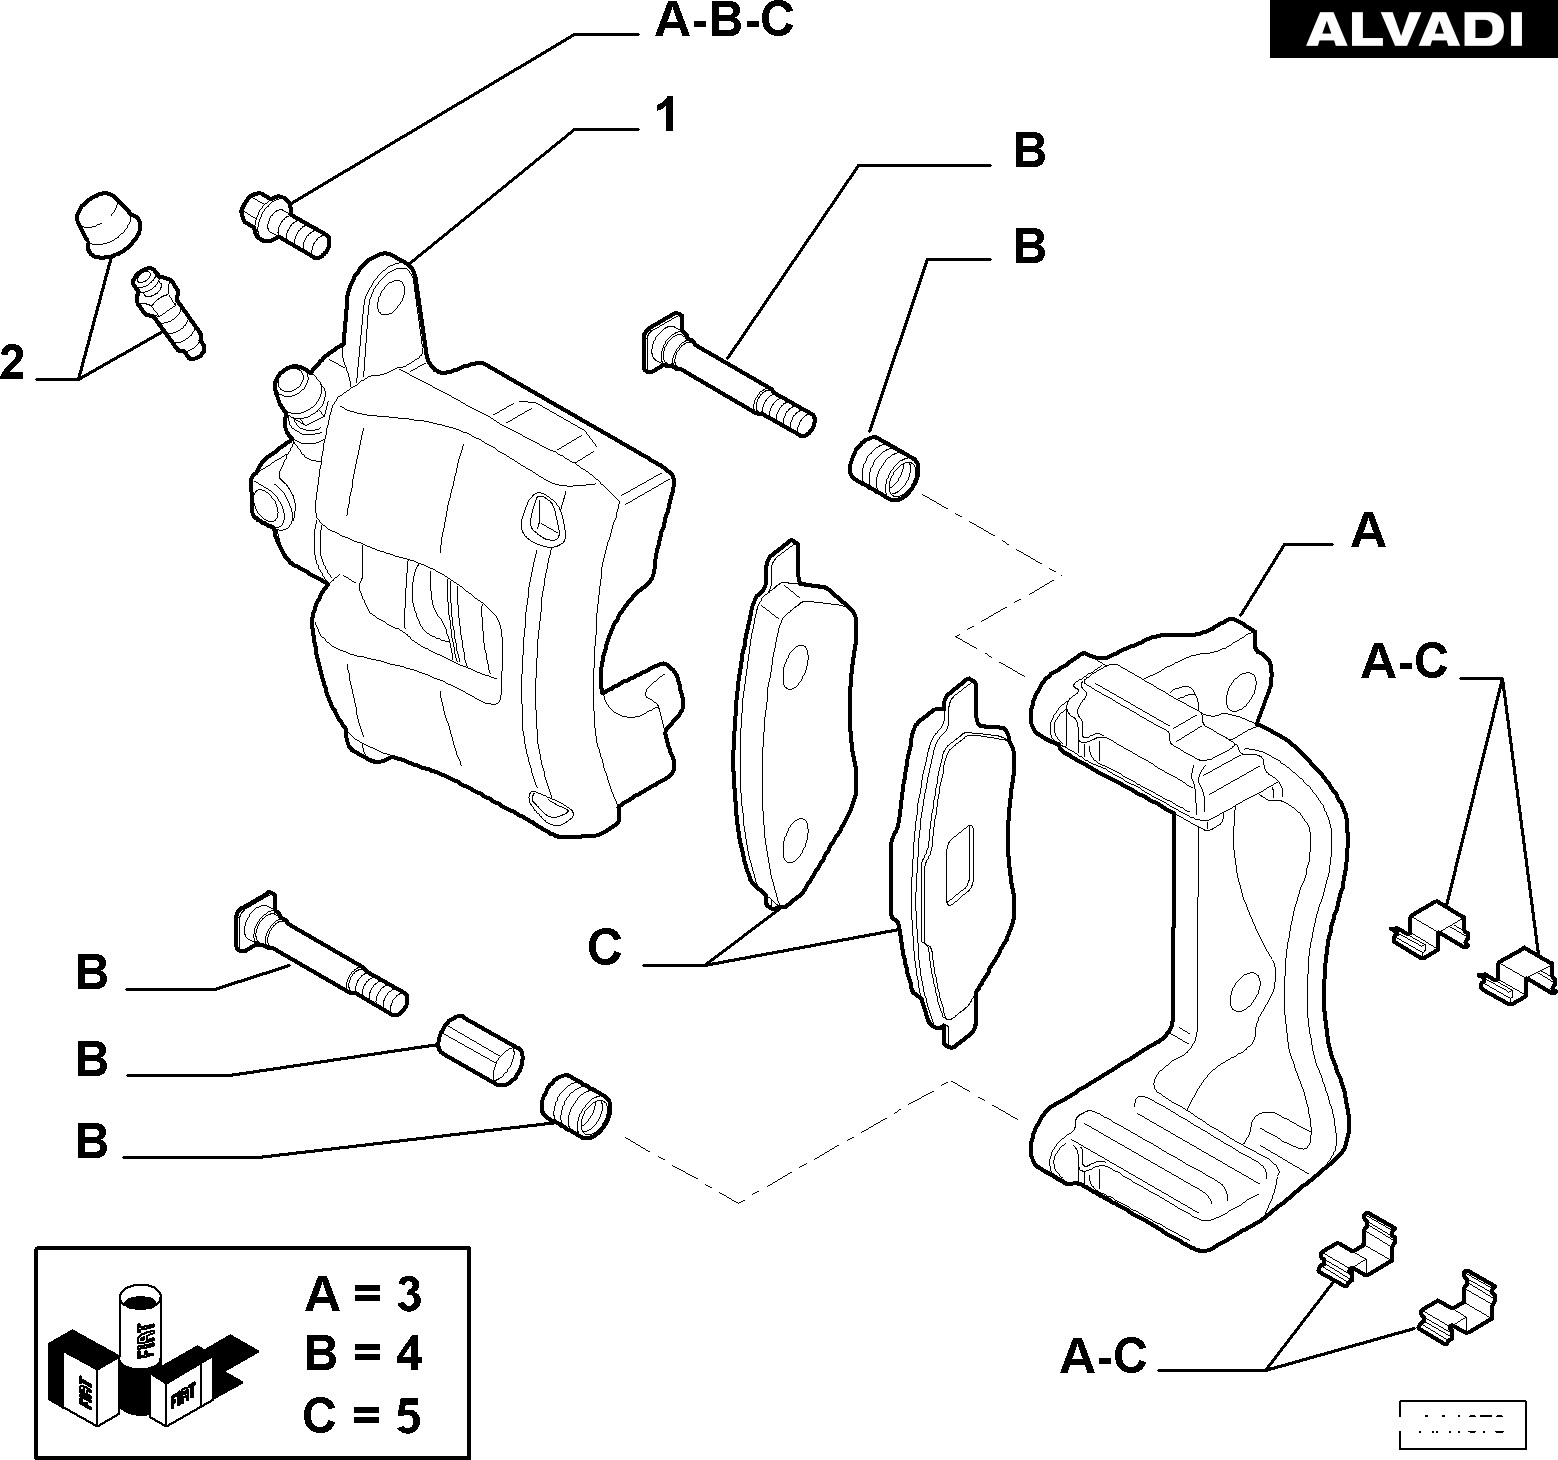 Car Brake assembly Diagram Alfa Romeo Rear Caliper Lh Var 1 Rev 0 1 Of Car Brake assembly Diagram